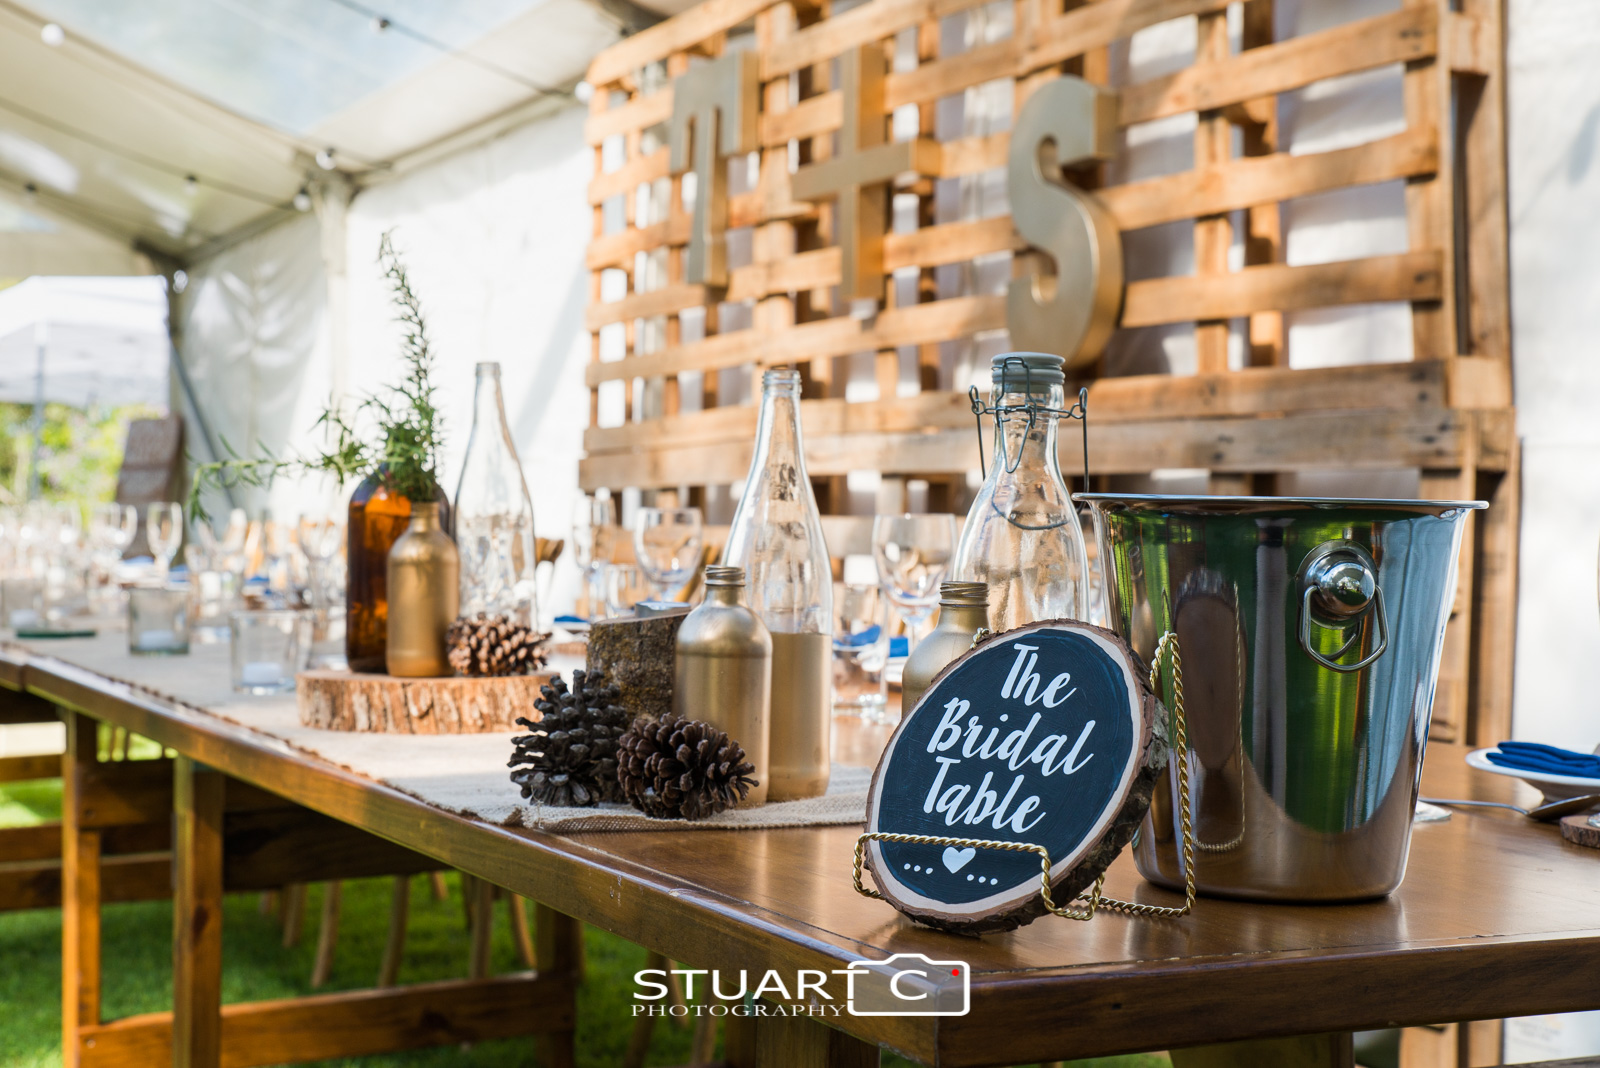 Preparation shot of bridal table decorations